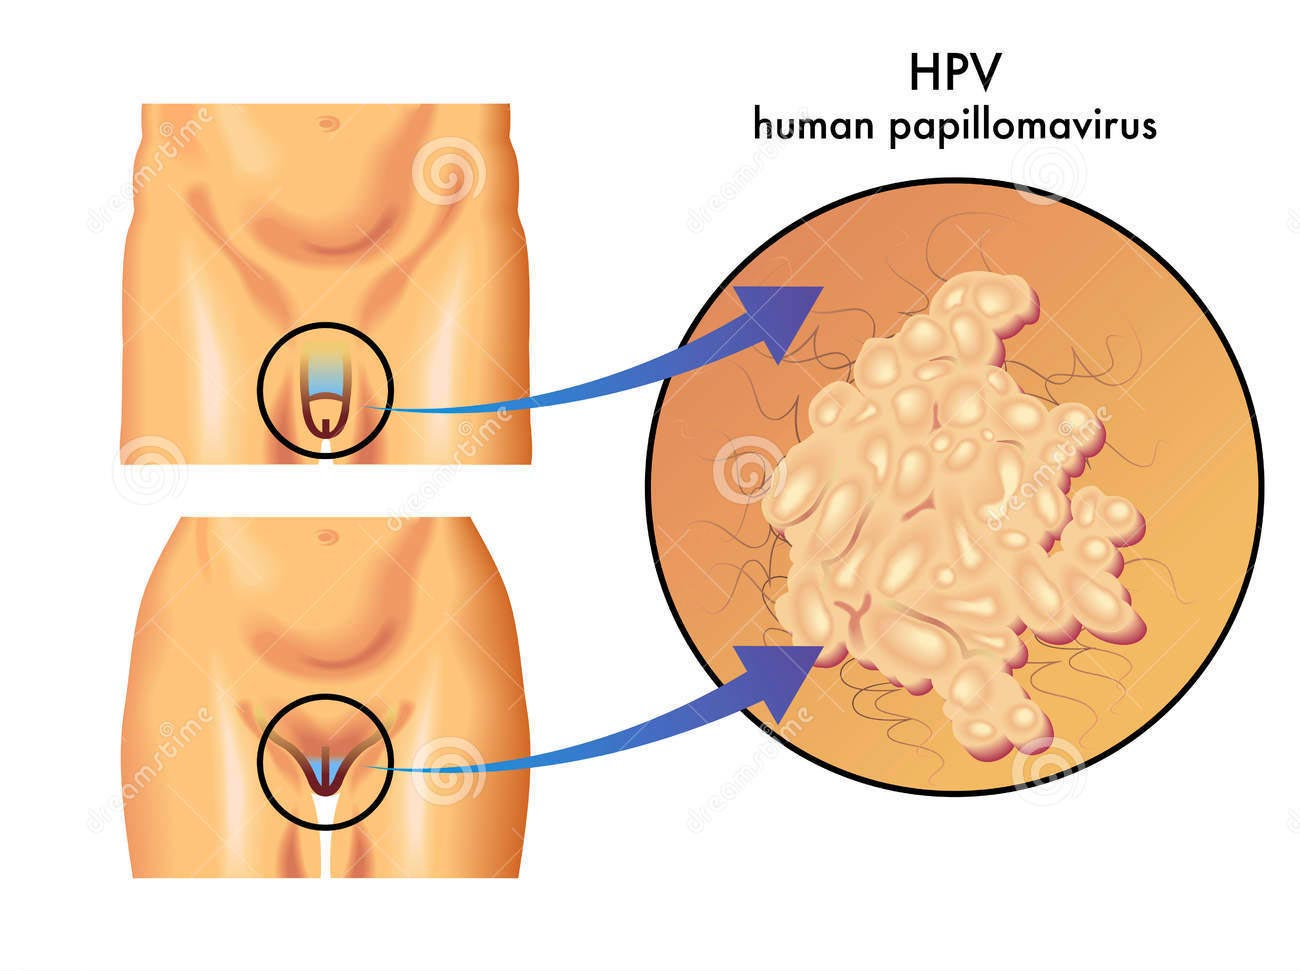 Papilloma virus nelluomo immagini,